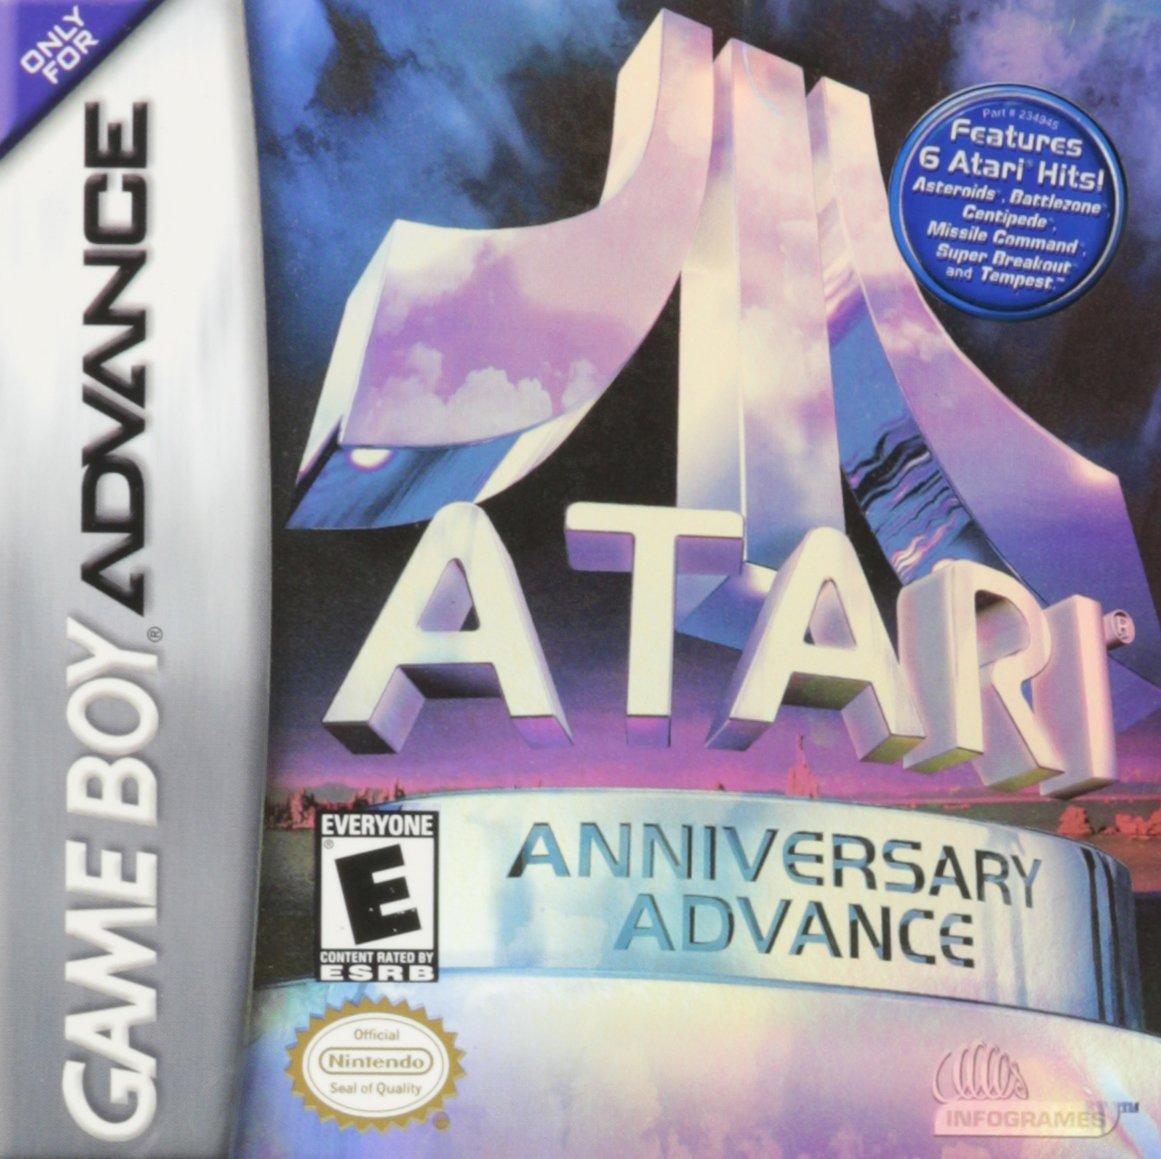 Atari Anniversary Advance facts and statistics